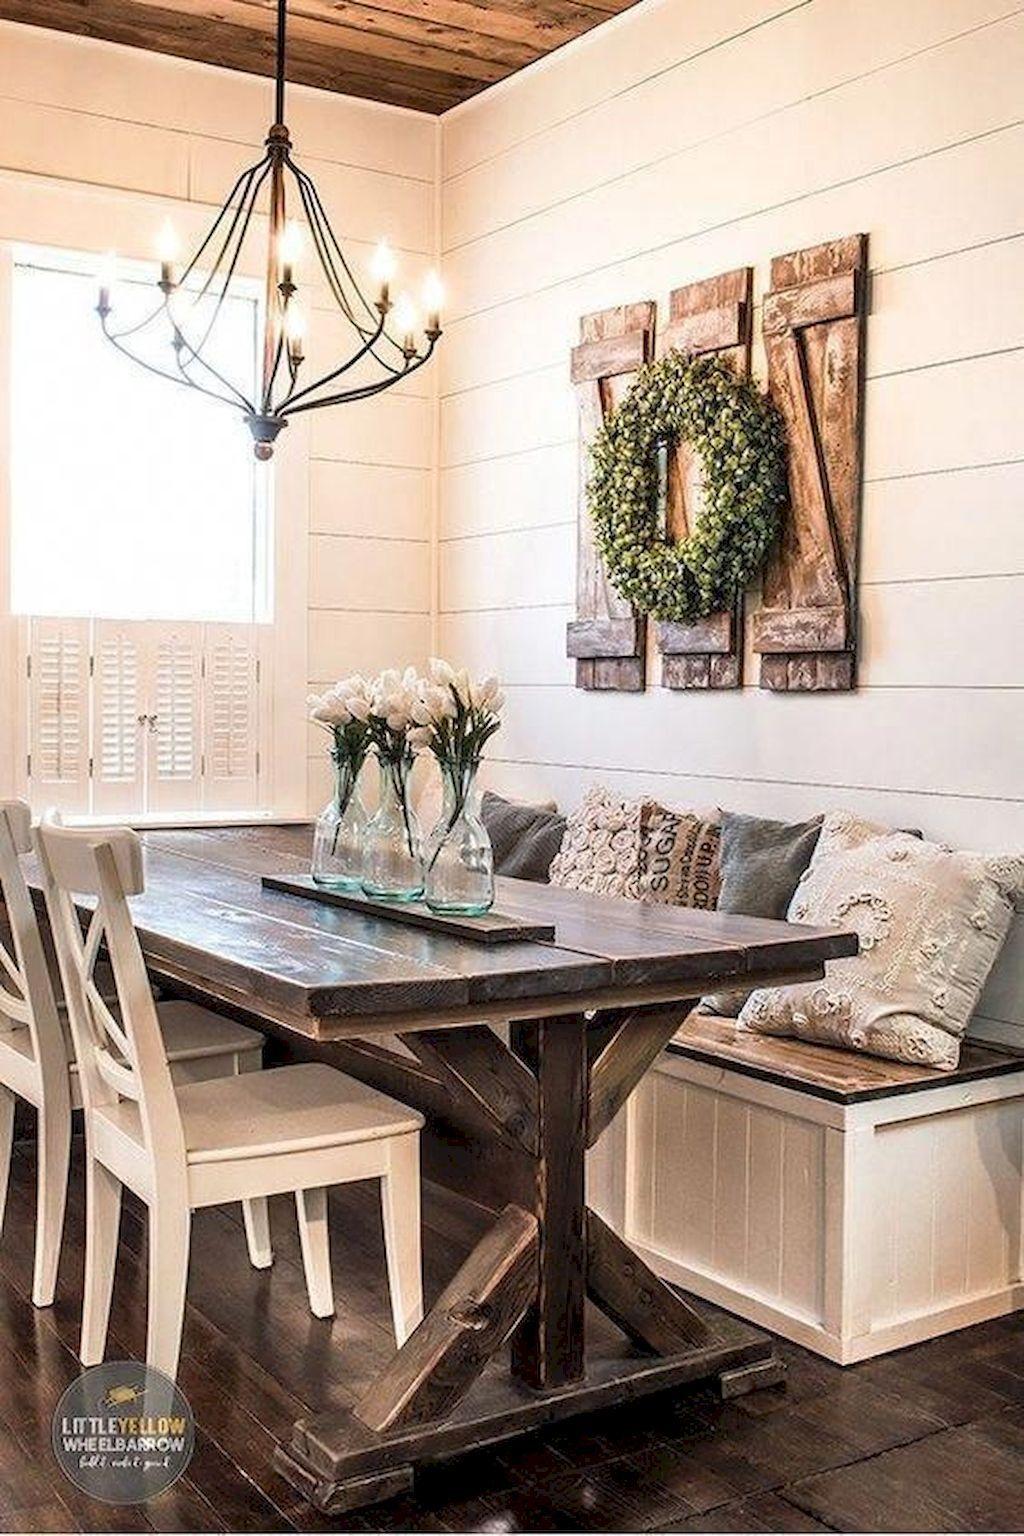 20 Easy DIY Rustic Farmhouse Decor Ideas in 2020